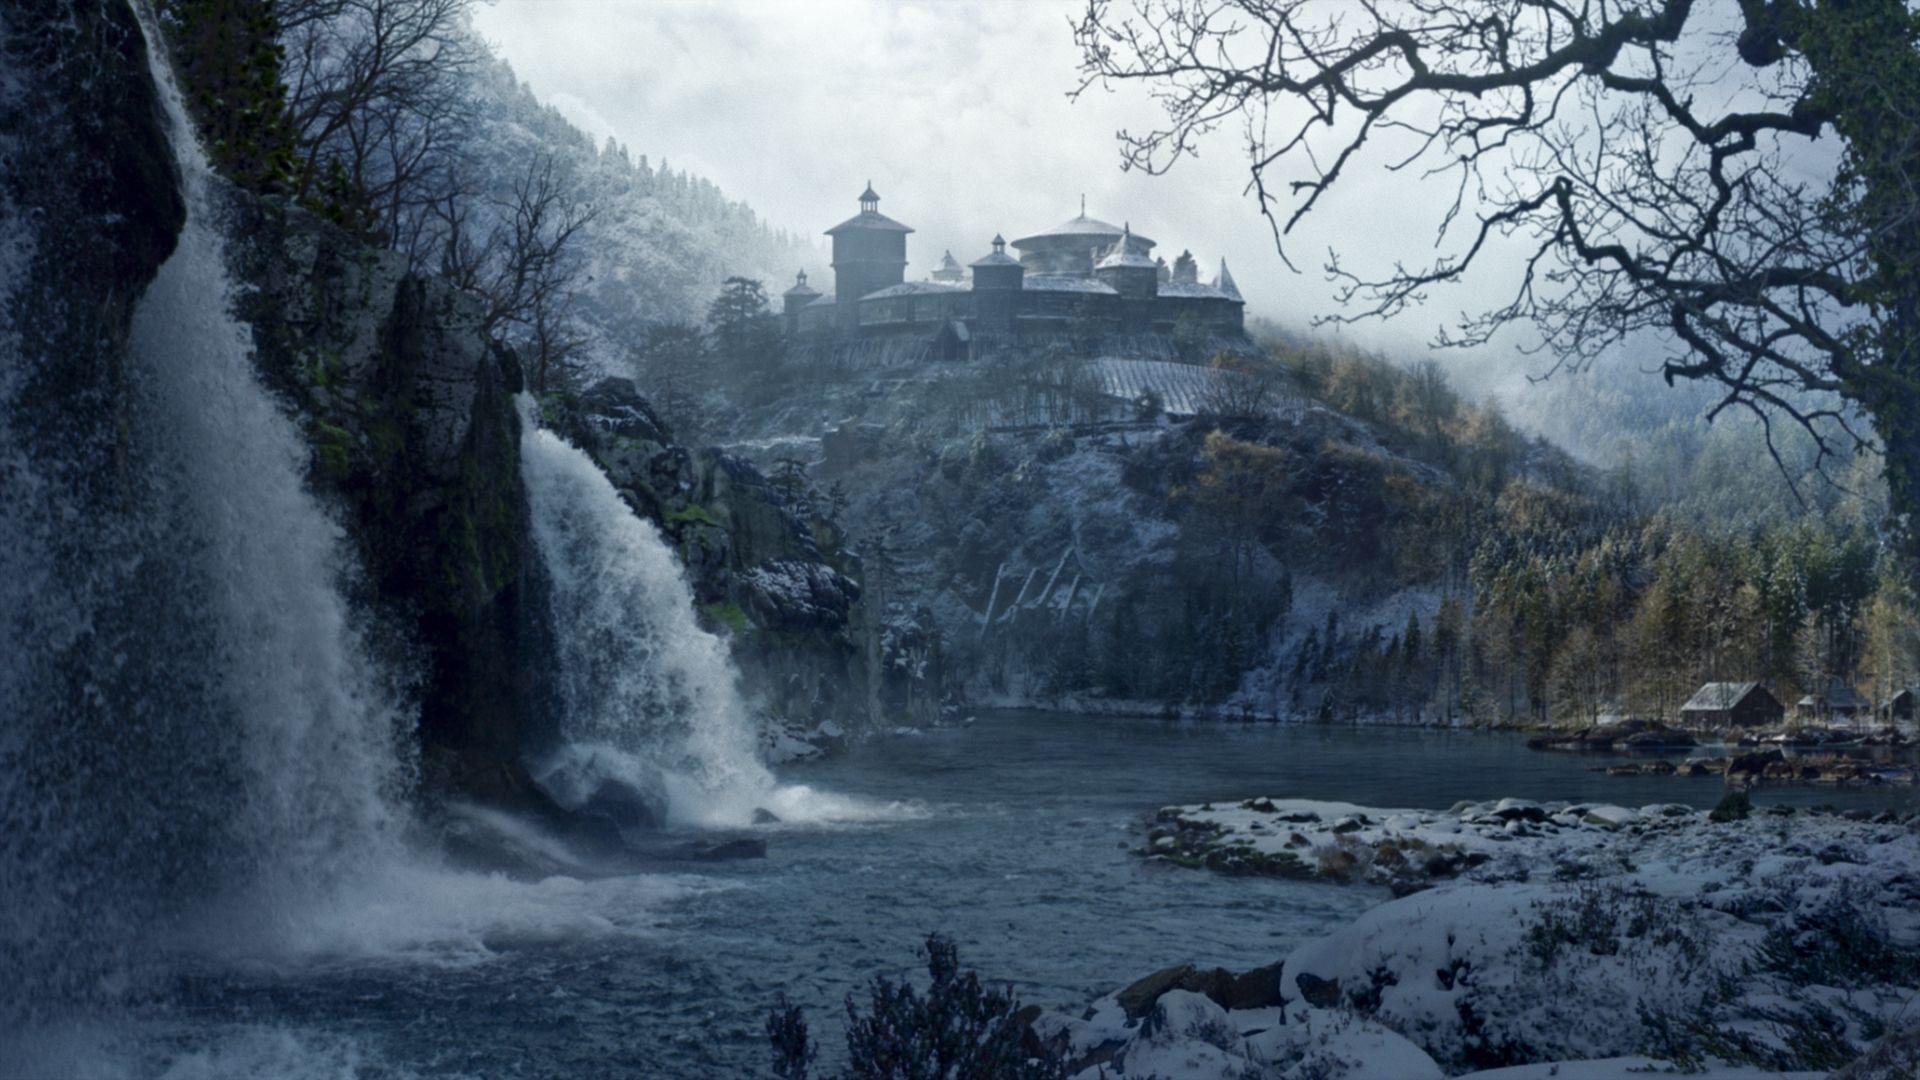 Game of Thrones landscape winter castle